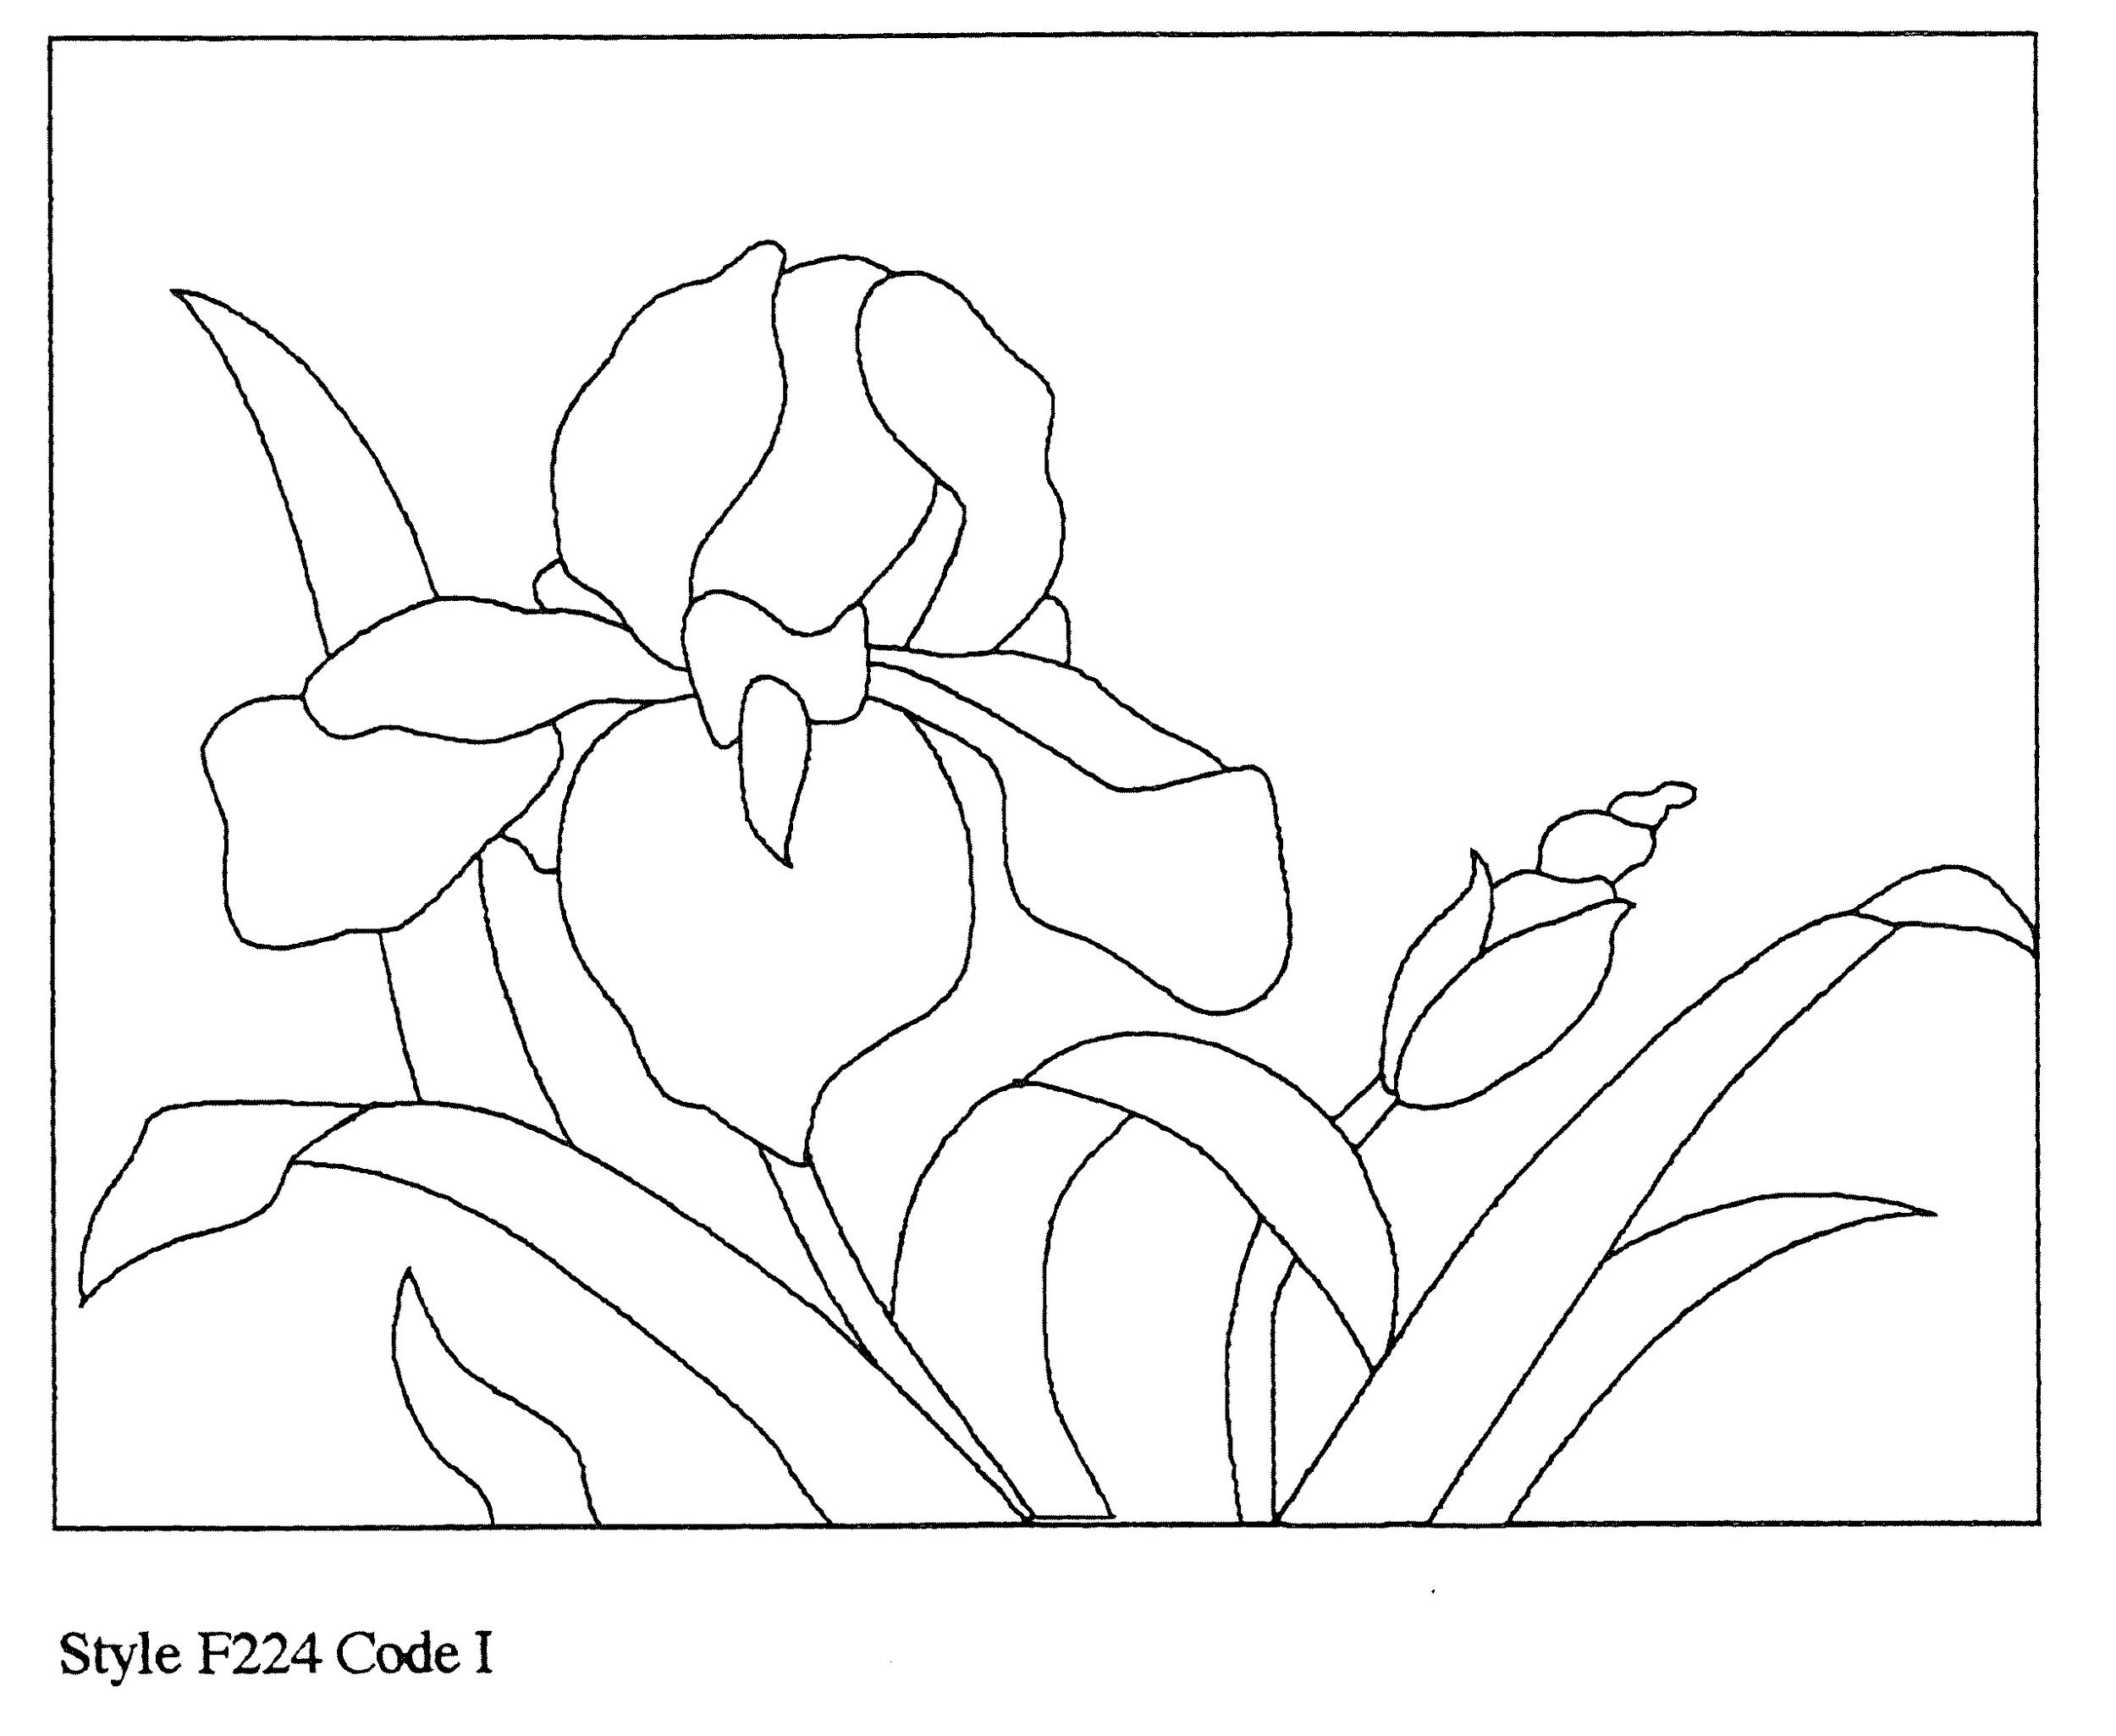 Page 11 copy 3.jpg